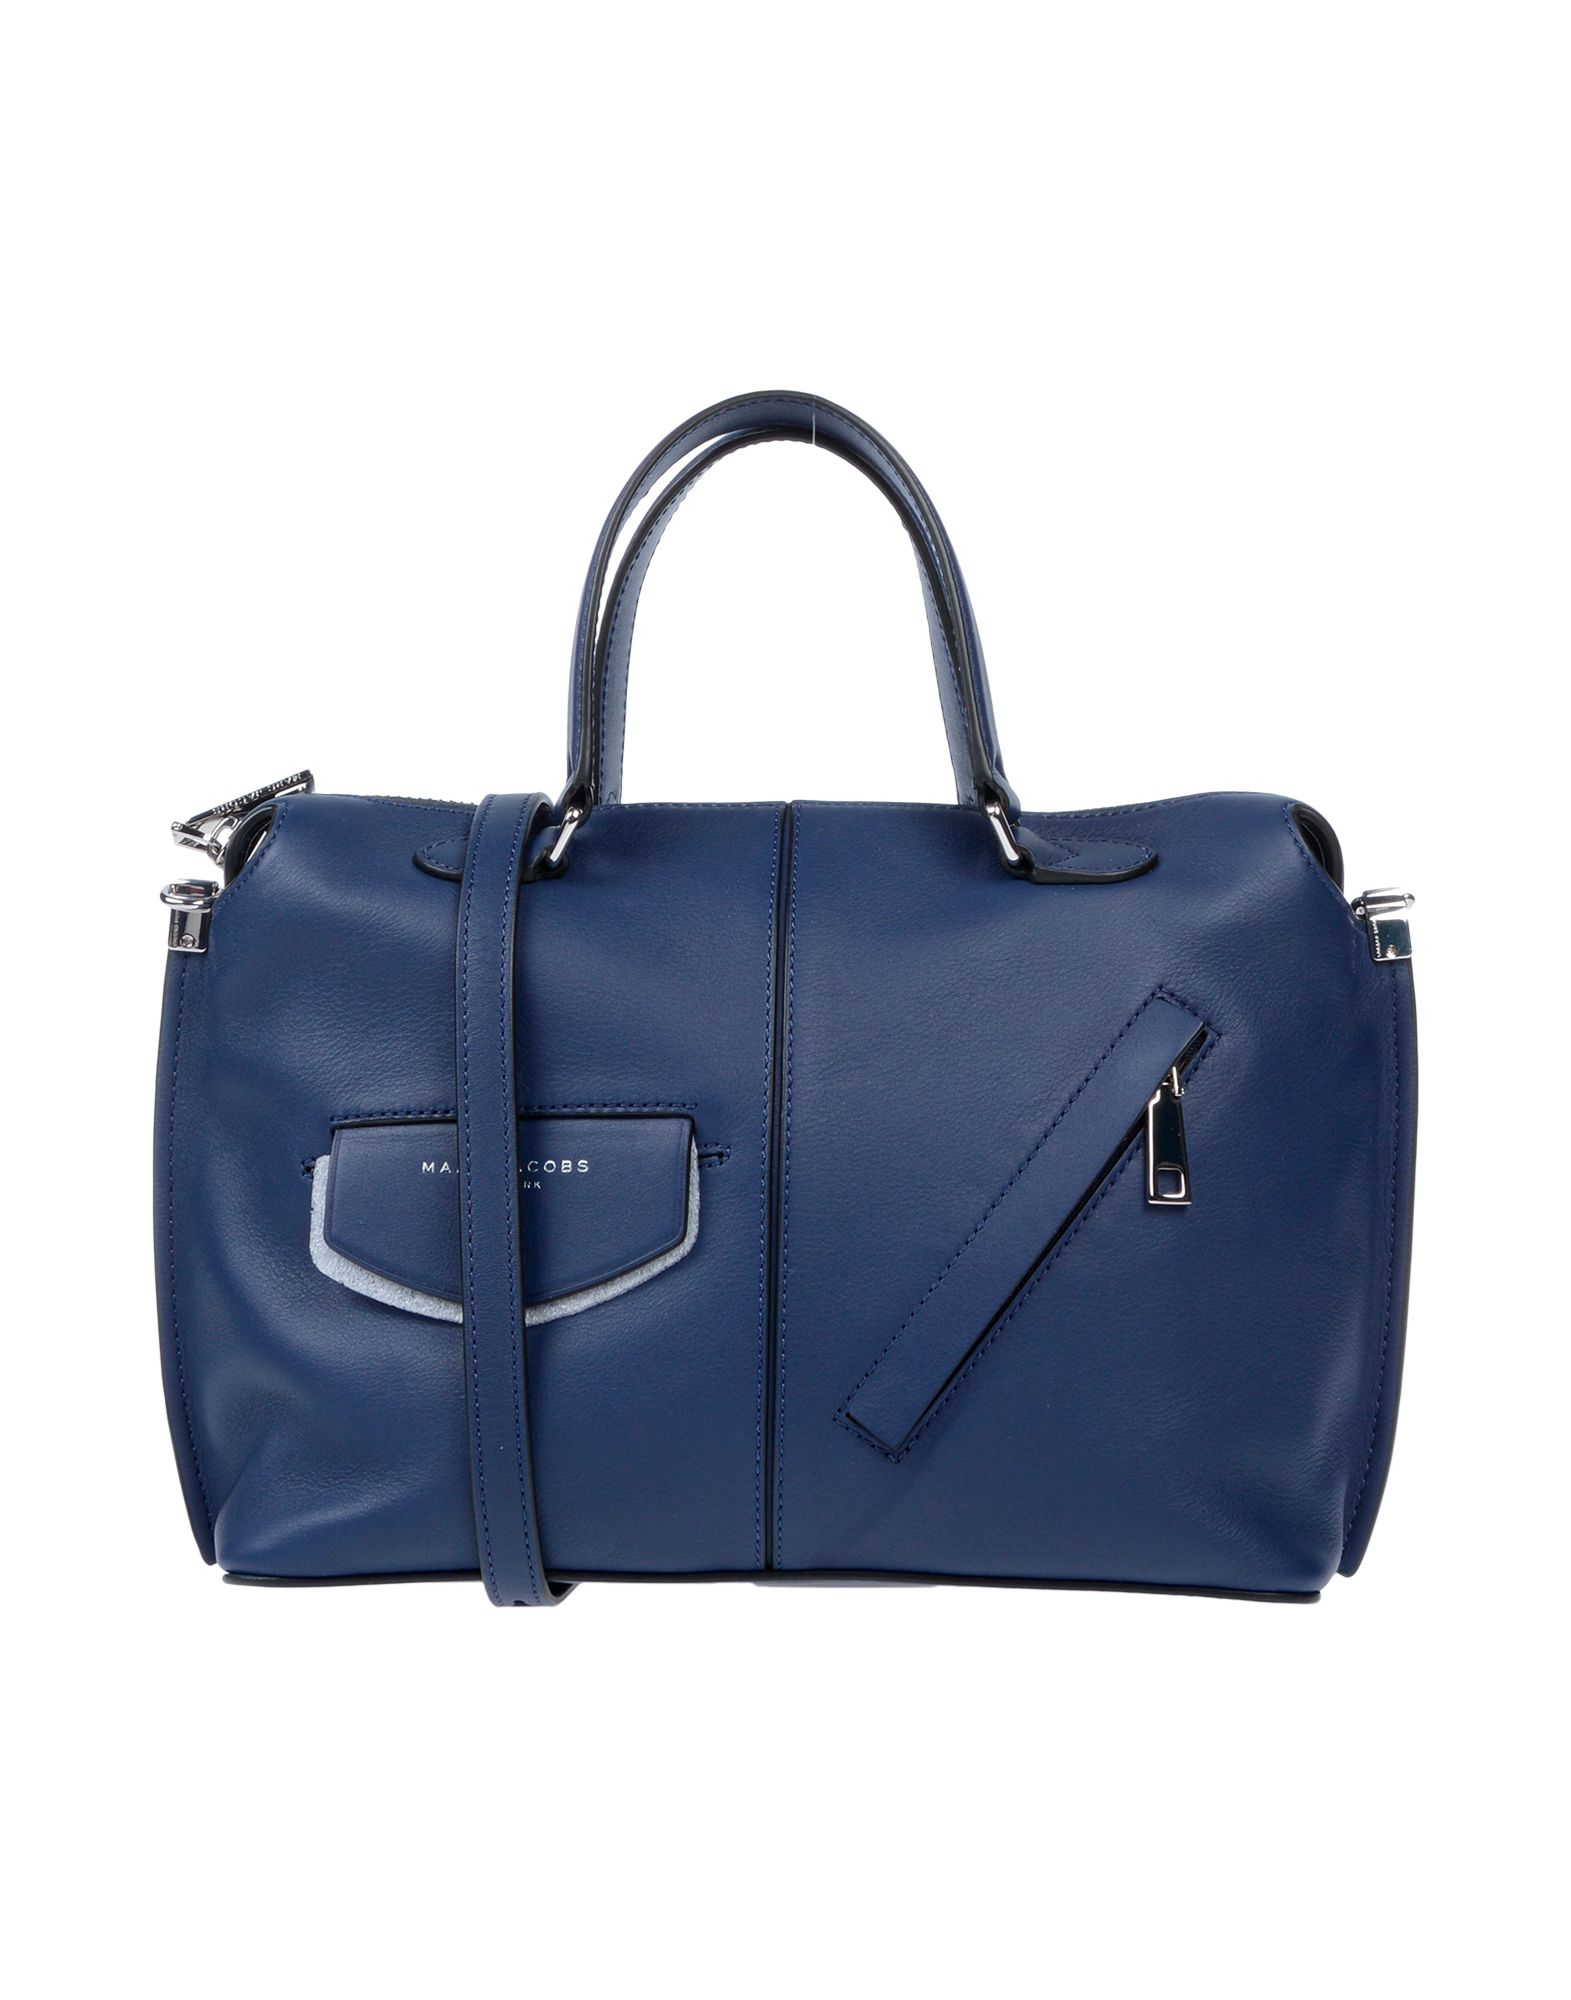 a0e042a6eb59 Marc Jacobs Handbag - Women Marc Jacobs Handbags online on YOOX Hong ...